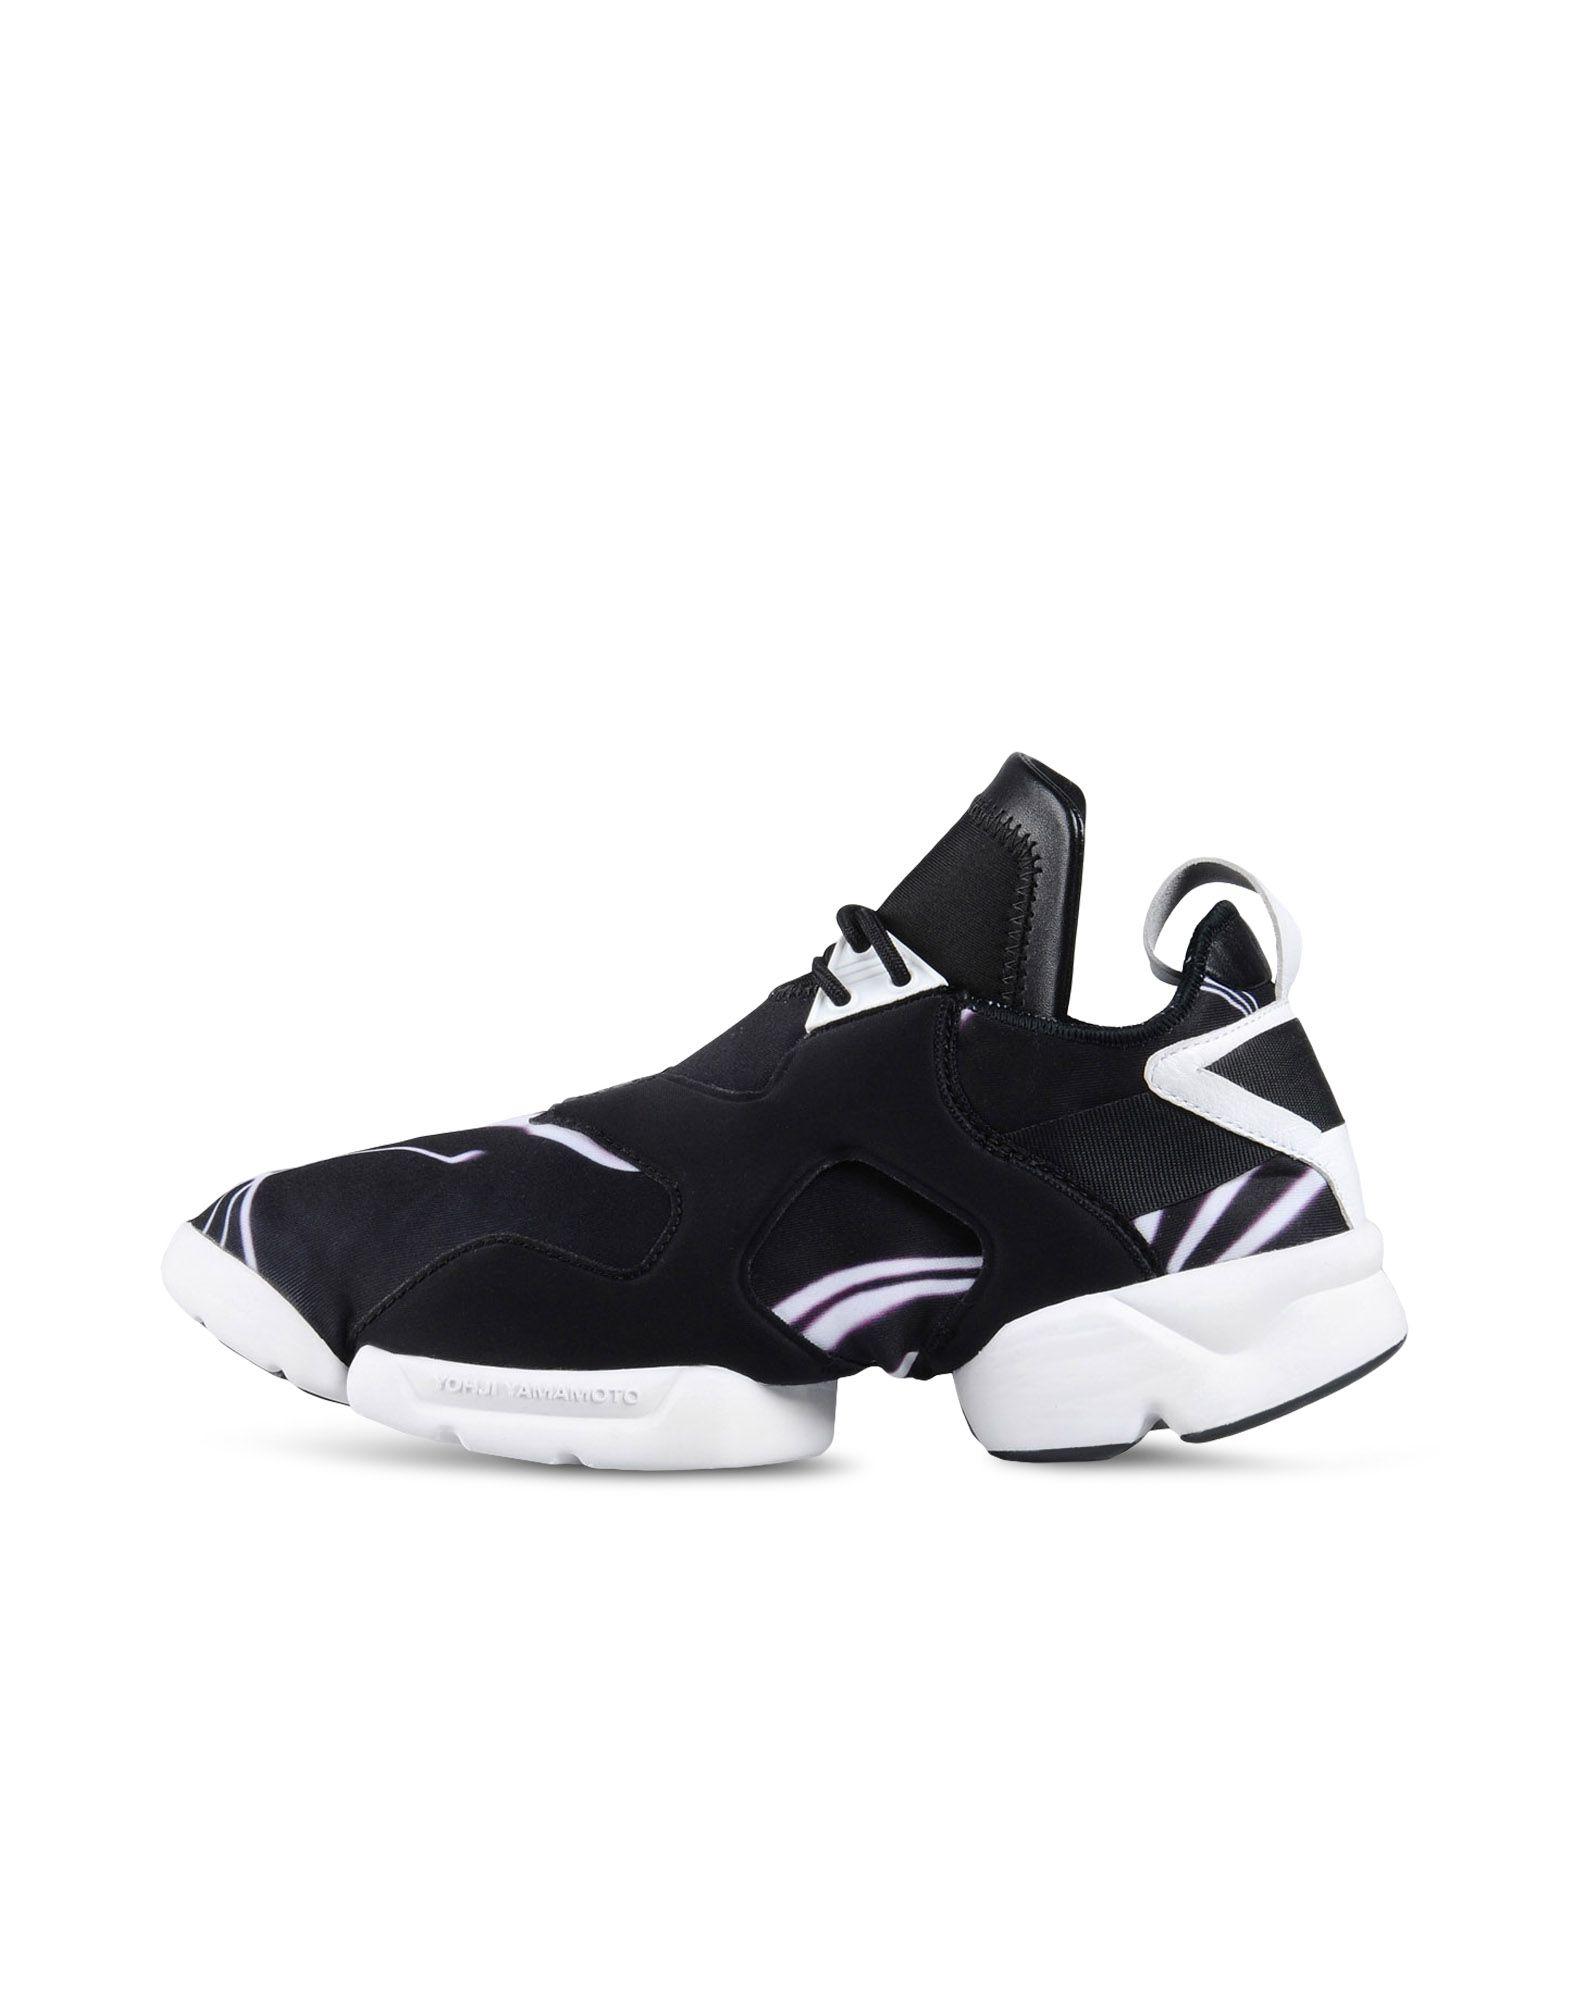 Y 3 KOHNA \u200e \u200eSneakers\u200e \u200e \u200e | Adidas Y-3